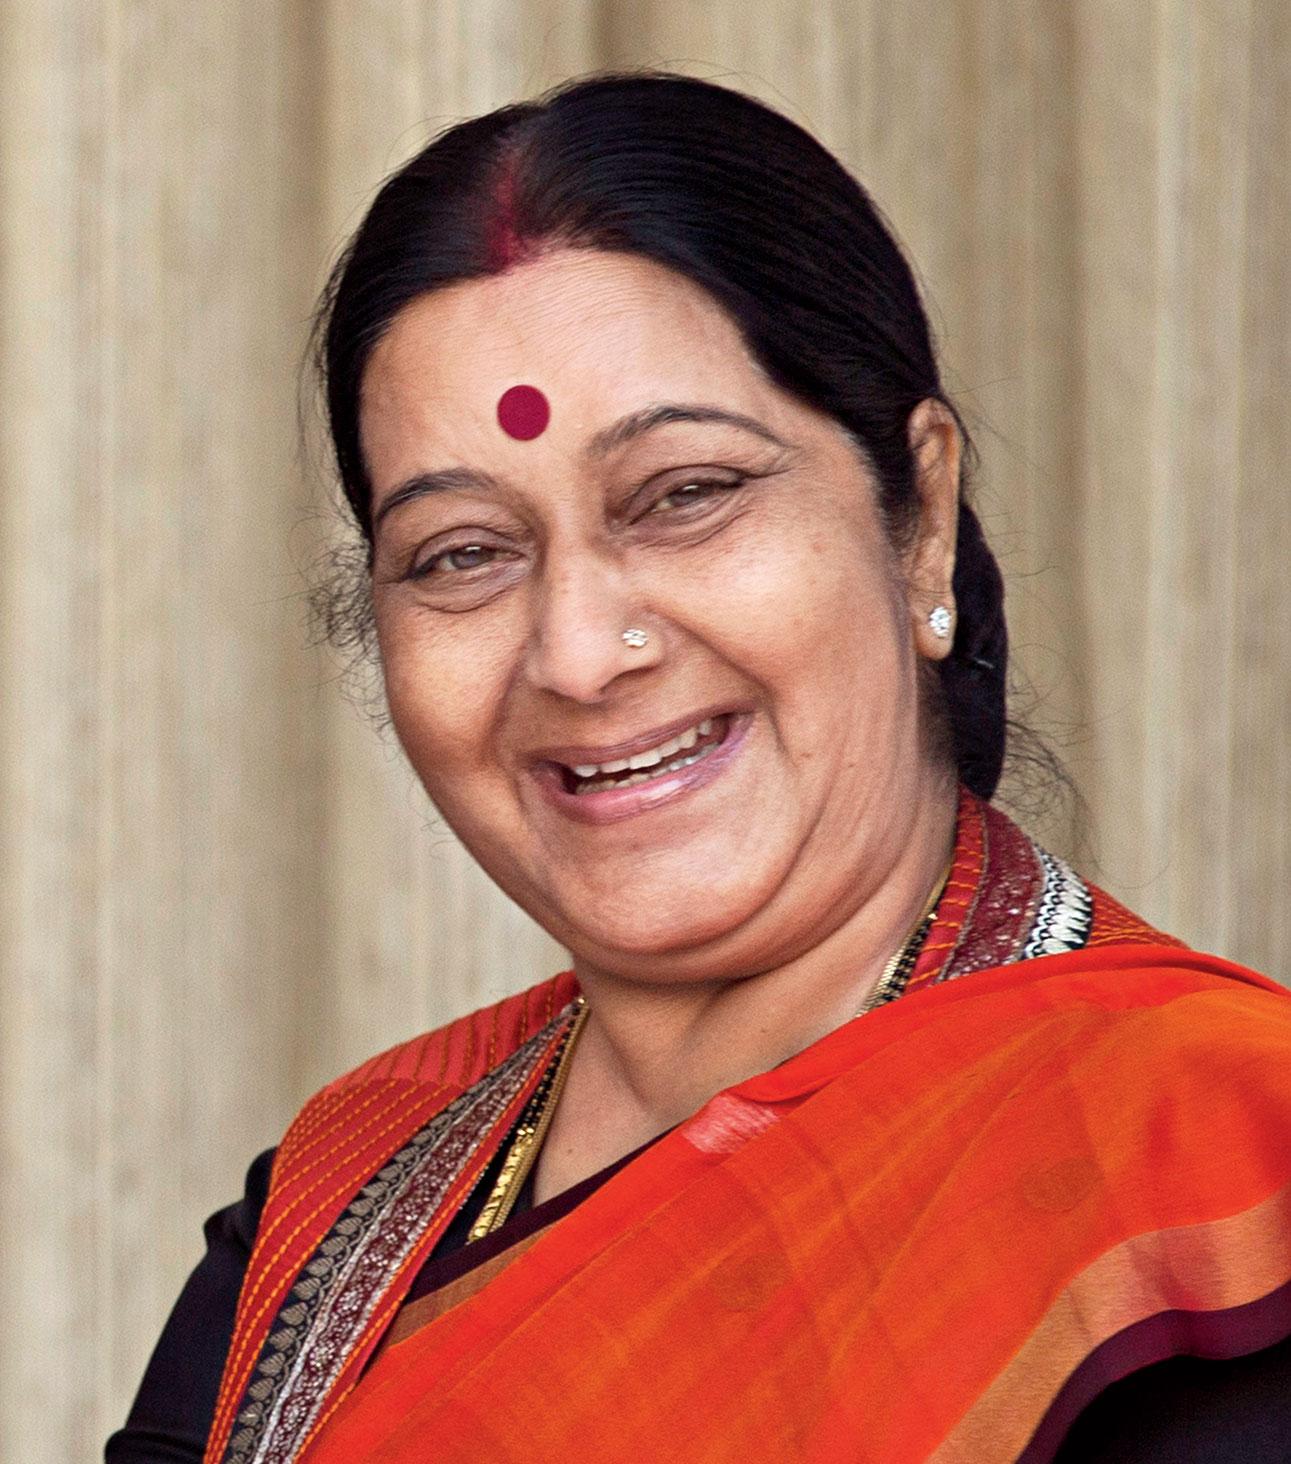 Sushma Swaraj, who had unsuccessfully taken on Sonia Gandhi in Karnataka's Bellari in 1999, had been a shining leader among the second generation promoted by Atal Bihari Vajpayee and Advani.